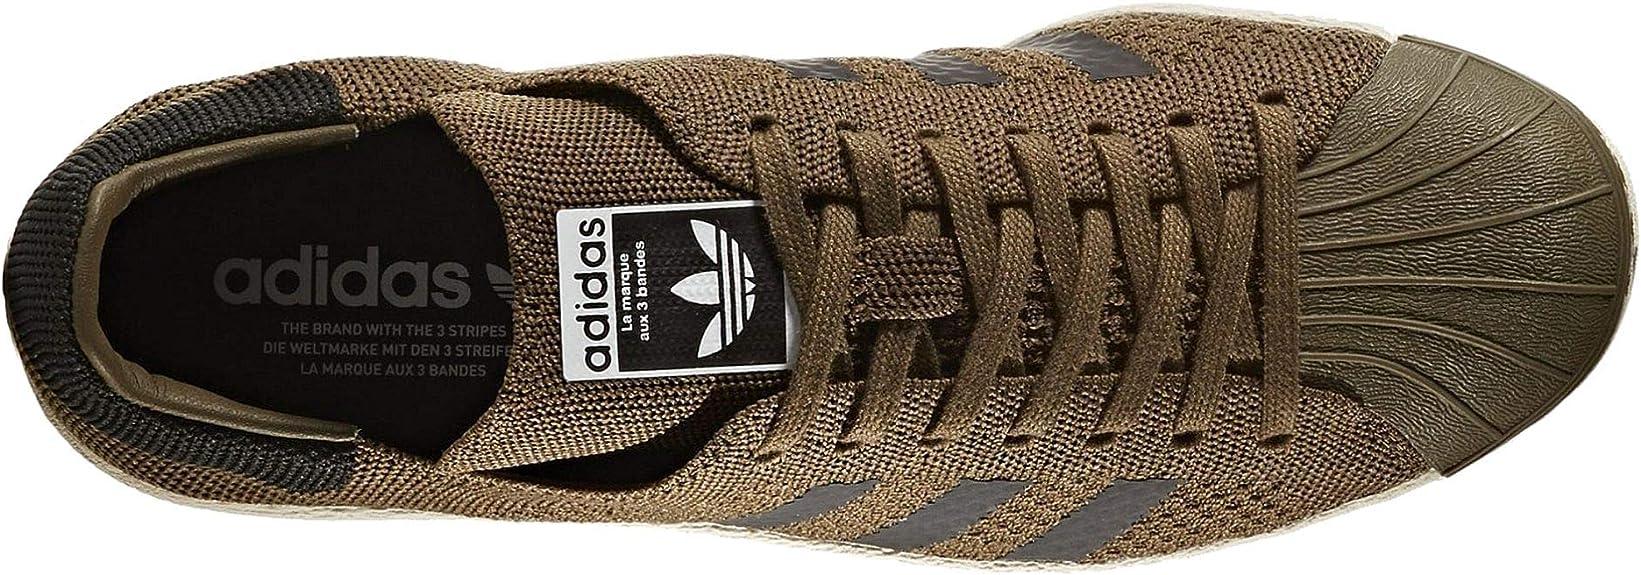 adidas Superstar 80s Primeknit, Sneakers Basses Homme, Vert